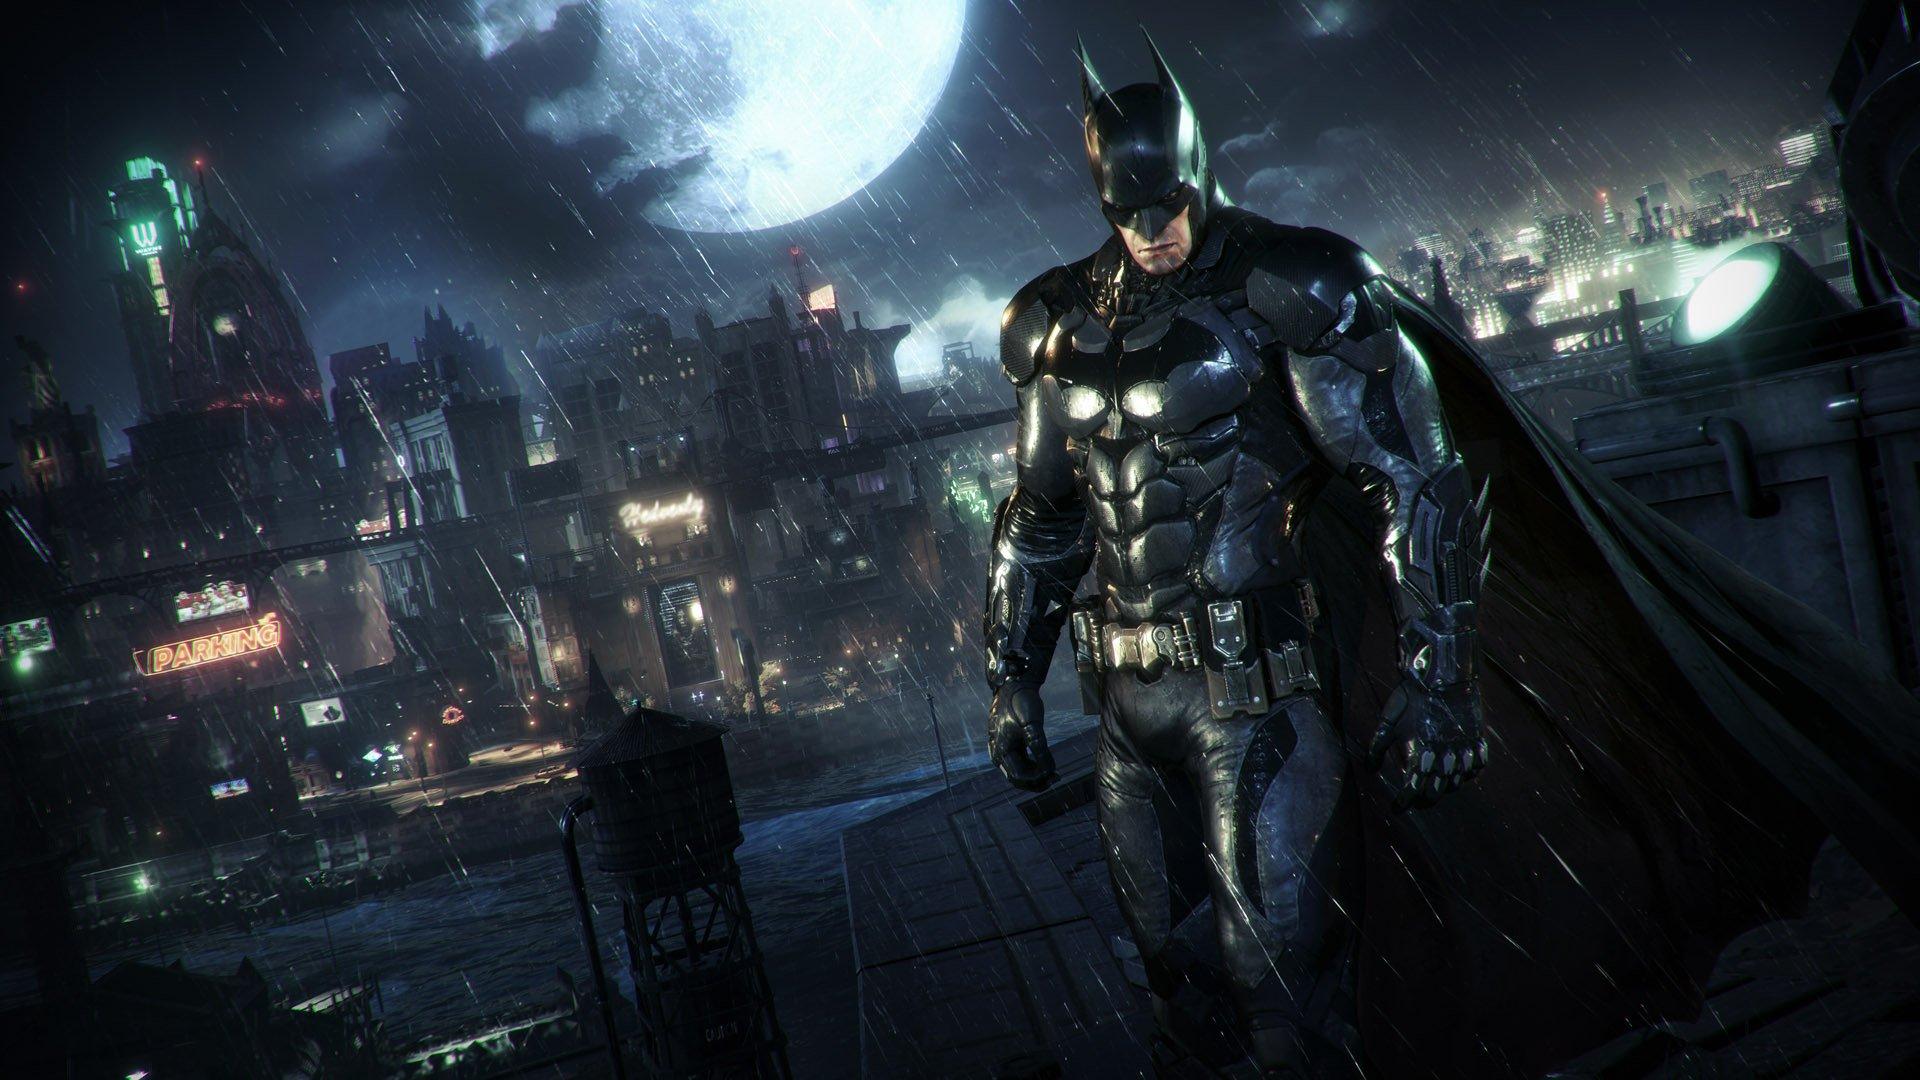 Batman Arkham Knight Full Hd Wallpaper And Background